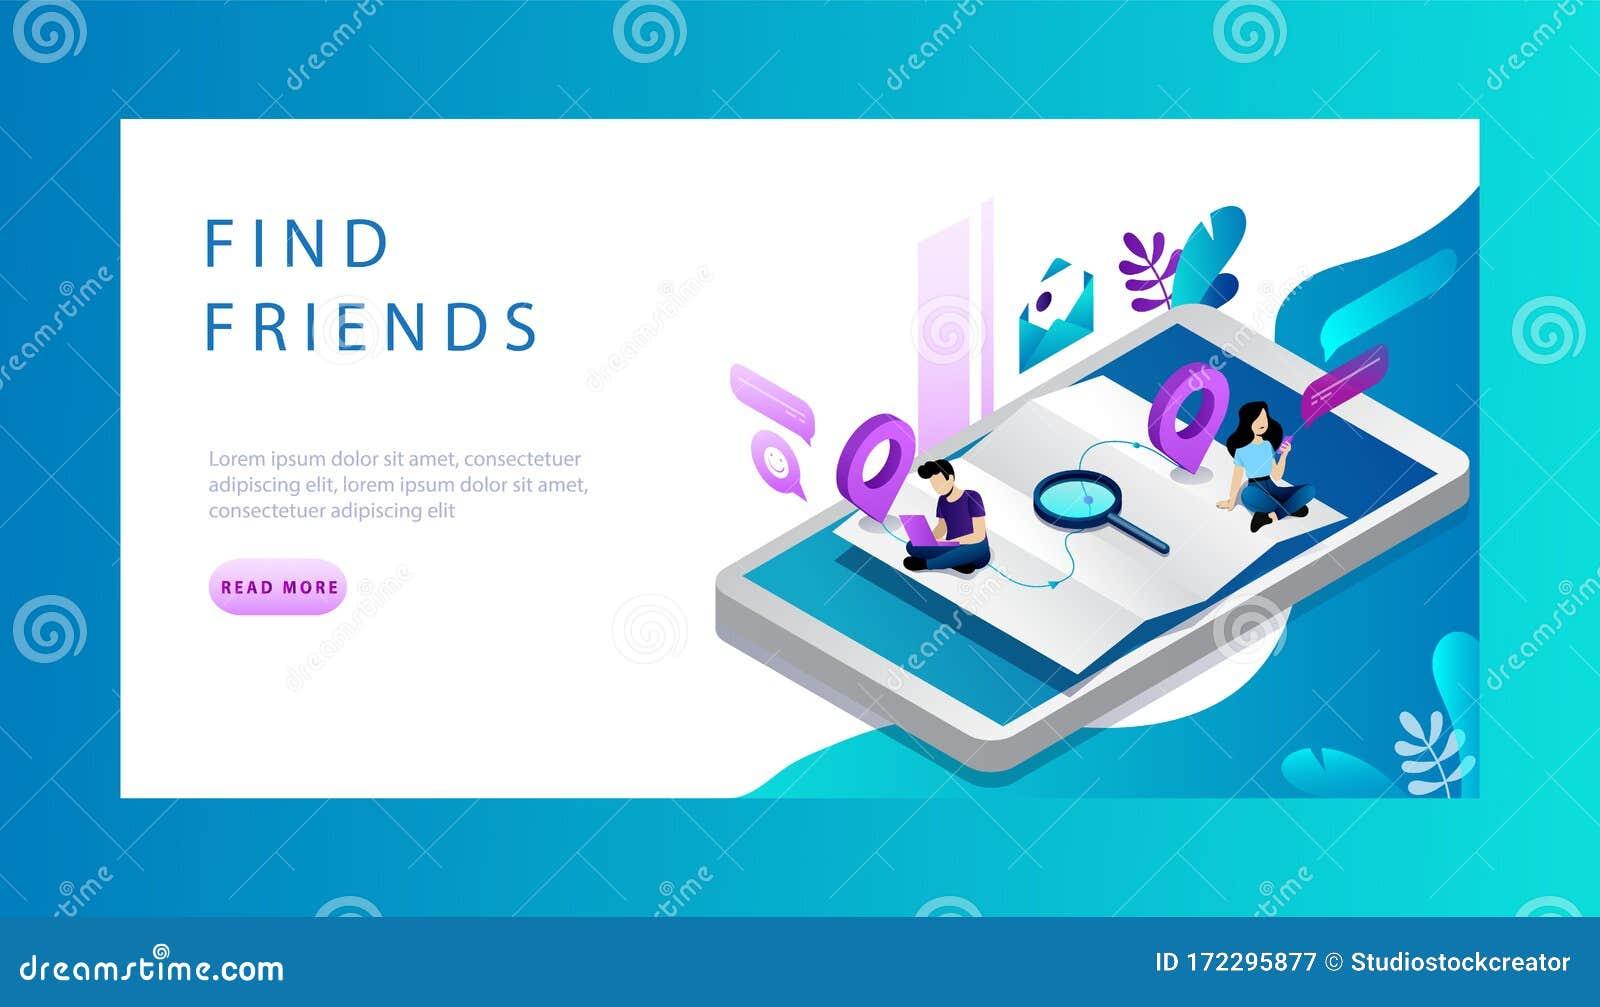 Get your friends or a celebrities password